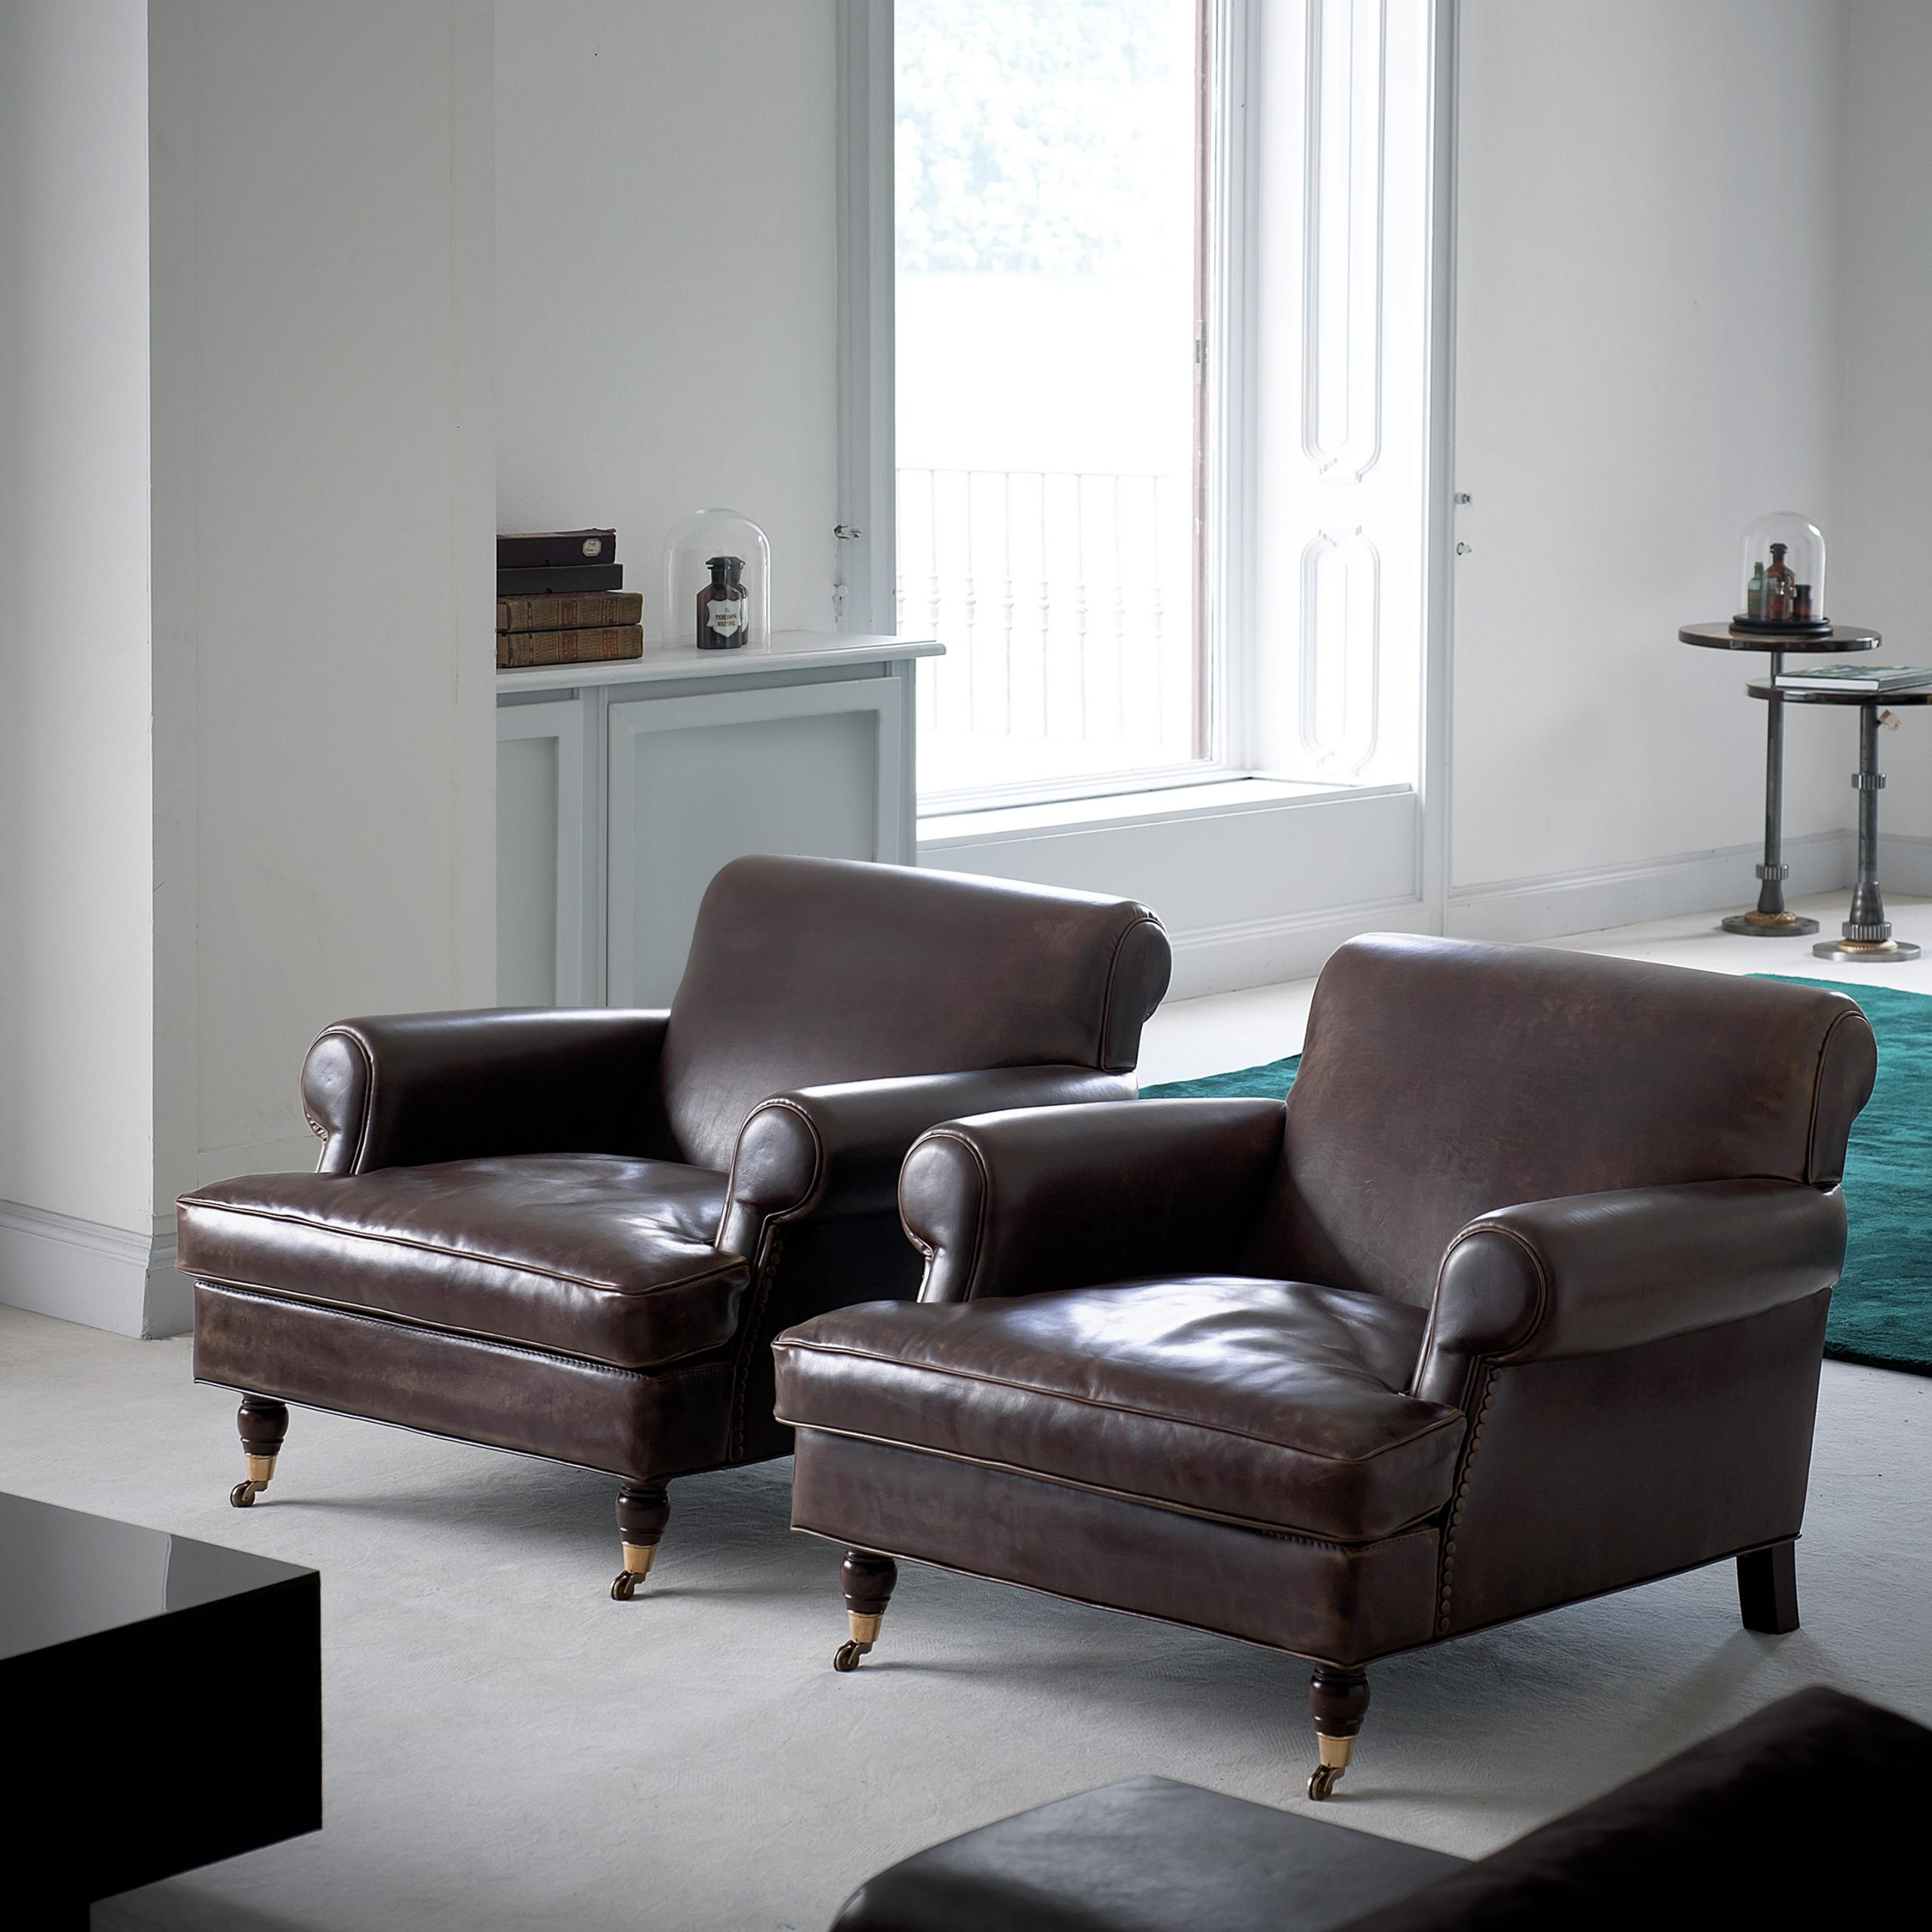 baxter Armchairs